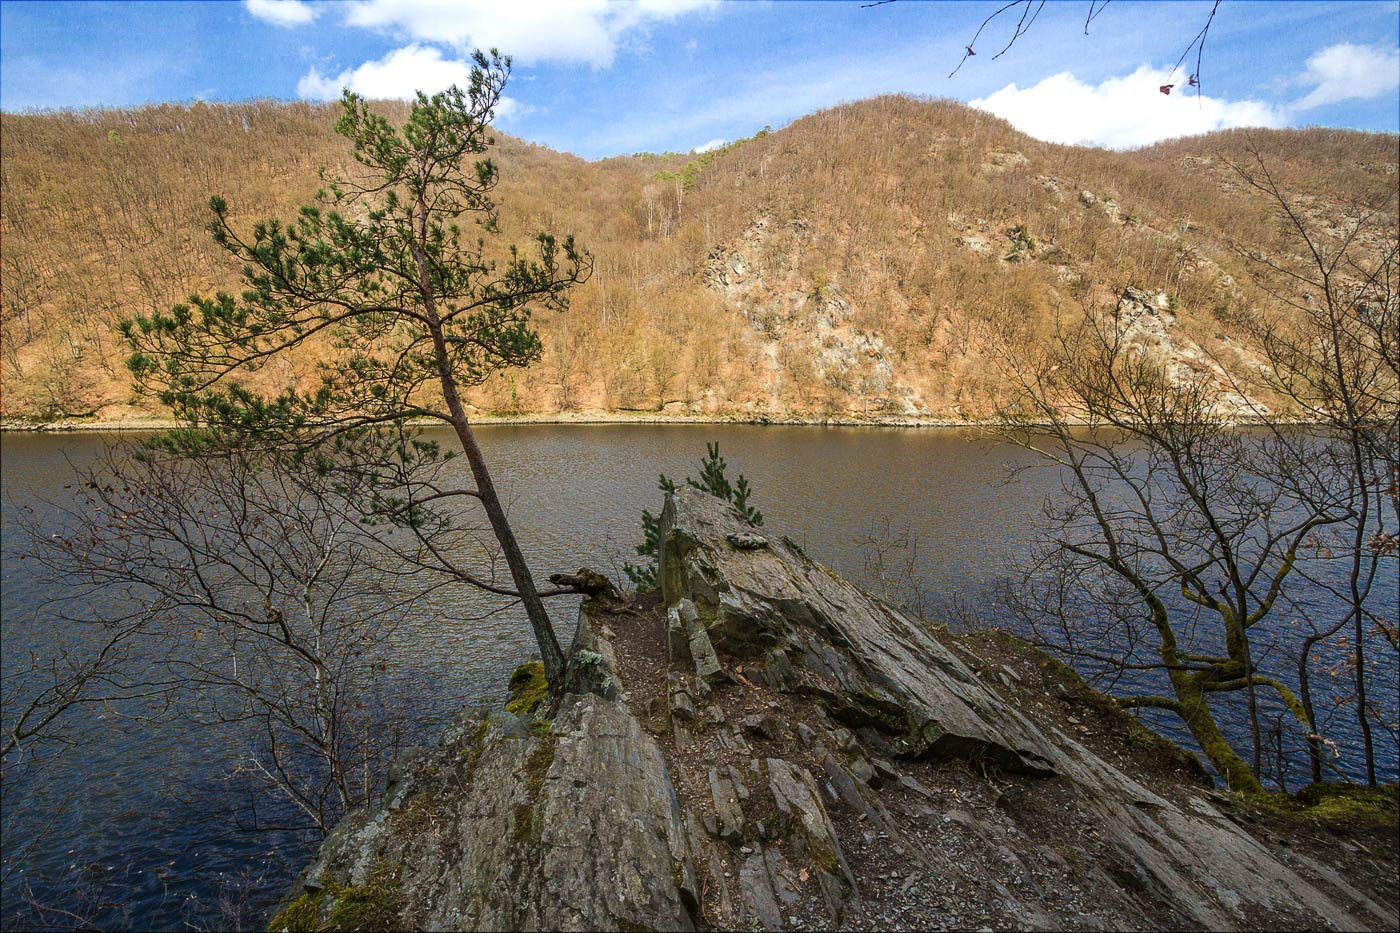 http://countryczech.com/wp-content/uploads/2017/03/photos/20160328-134407_Vltava_Svatojanske_proudy.jpg